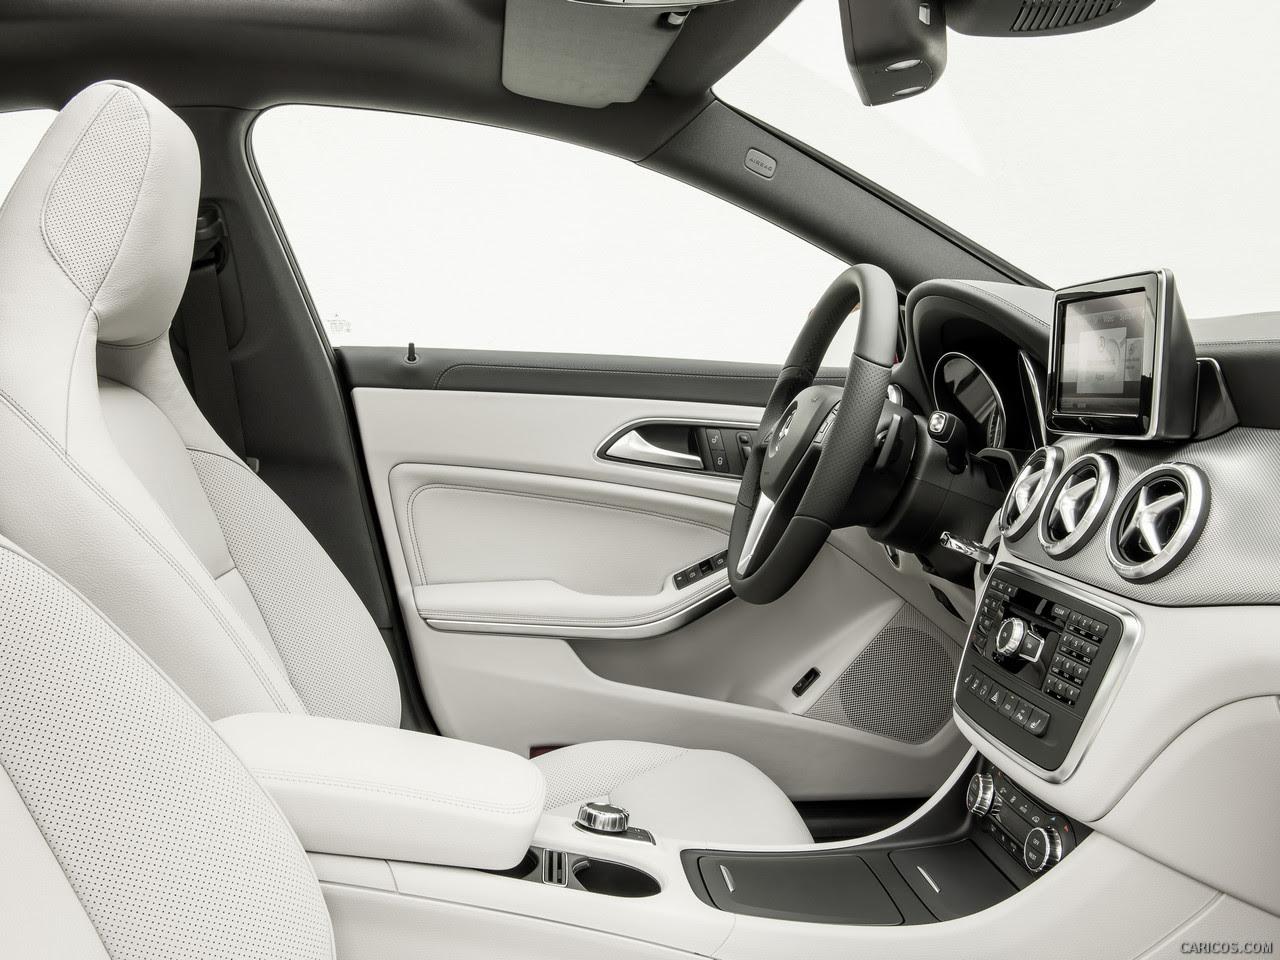 2014 Mercedes-Benz CLA-Class - Interior | Wallpaper #123 ...